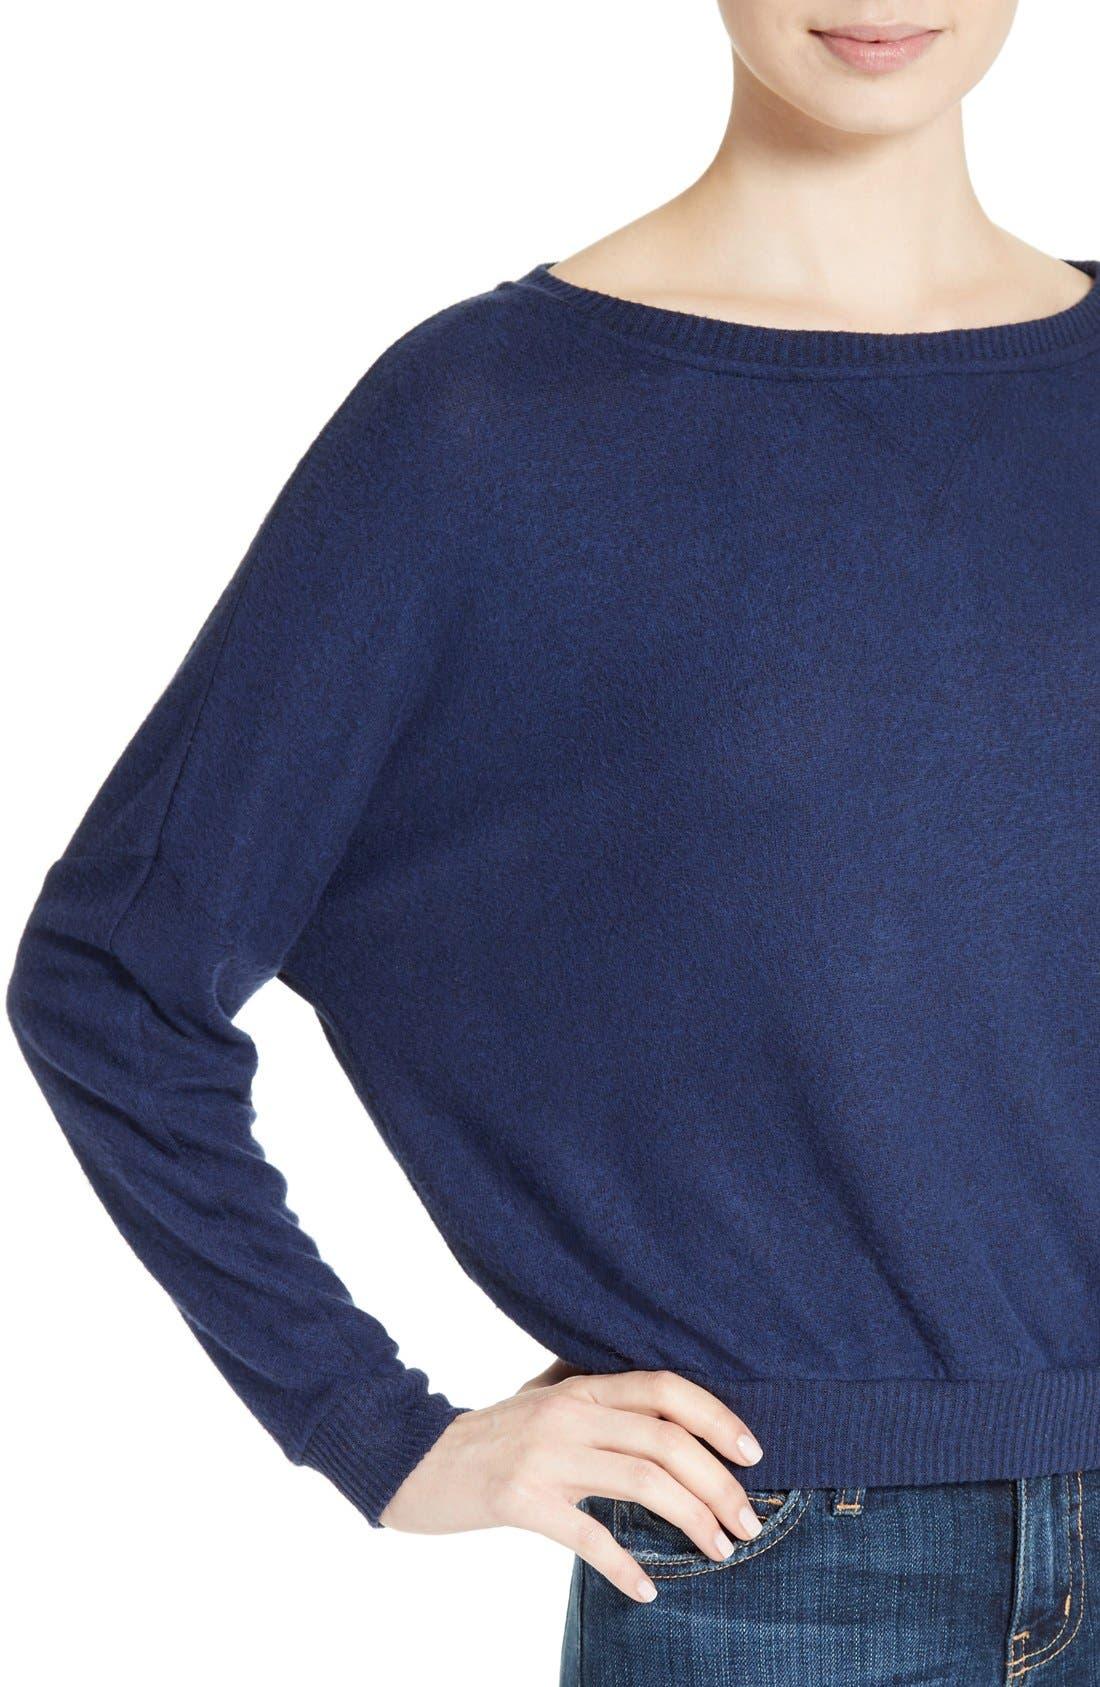 JOIE Soft Joie Giardia Drop Shoulder Sweater, Main, color, PEACOAT